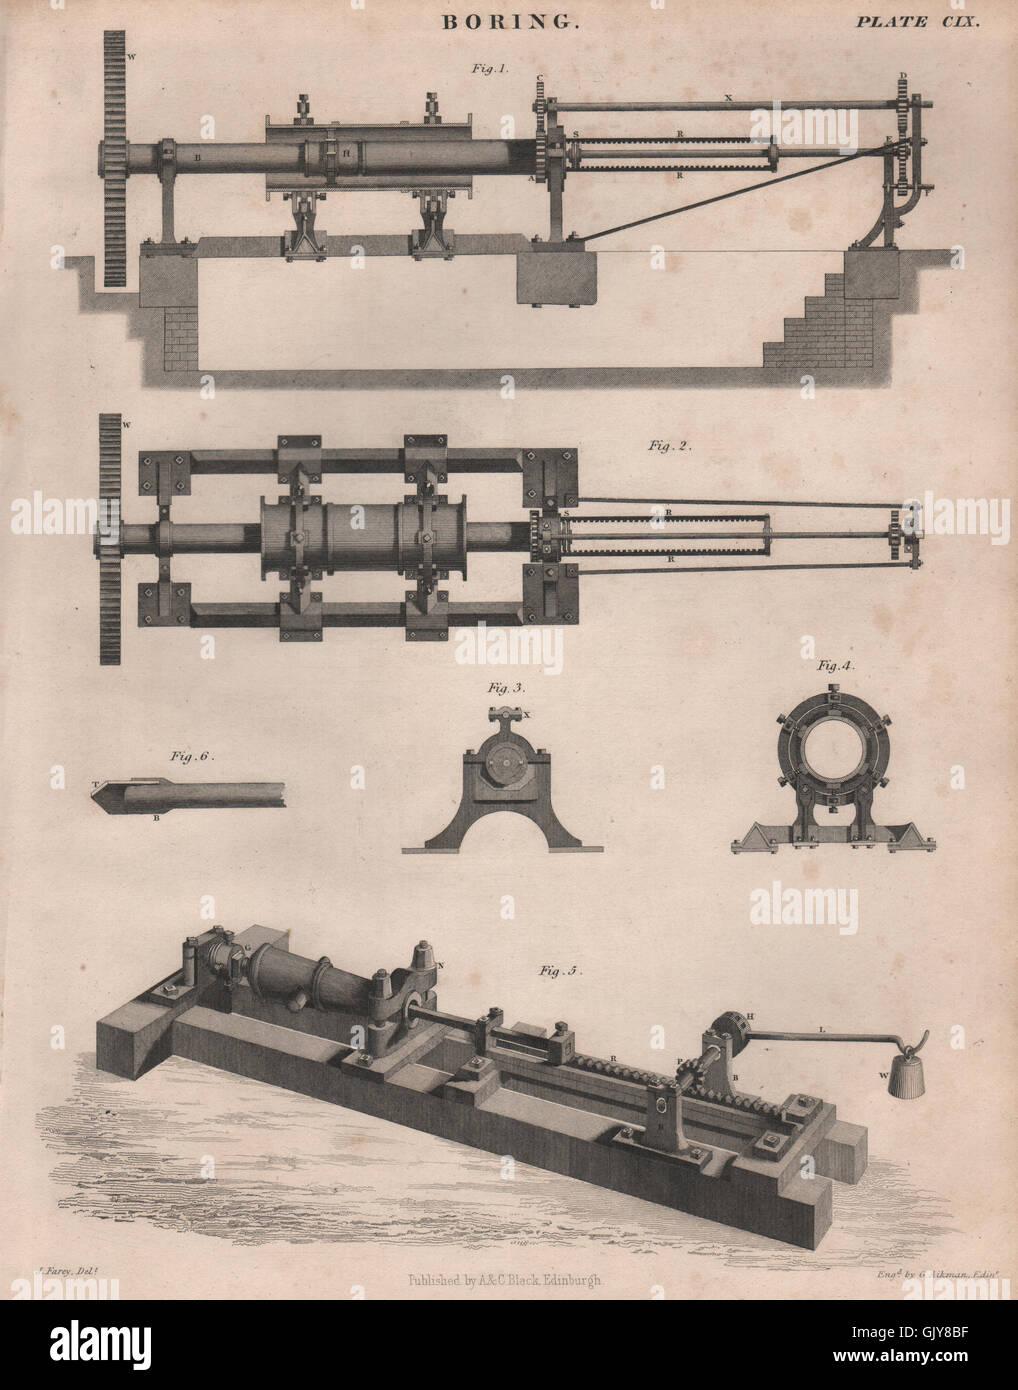 Victorian Equipment Stockfotos & Victorian Equipment Bilder - Alamy